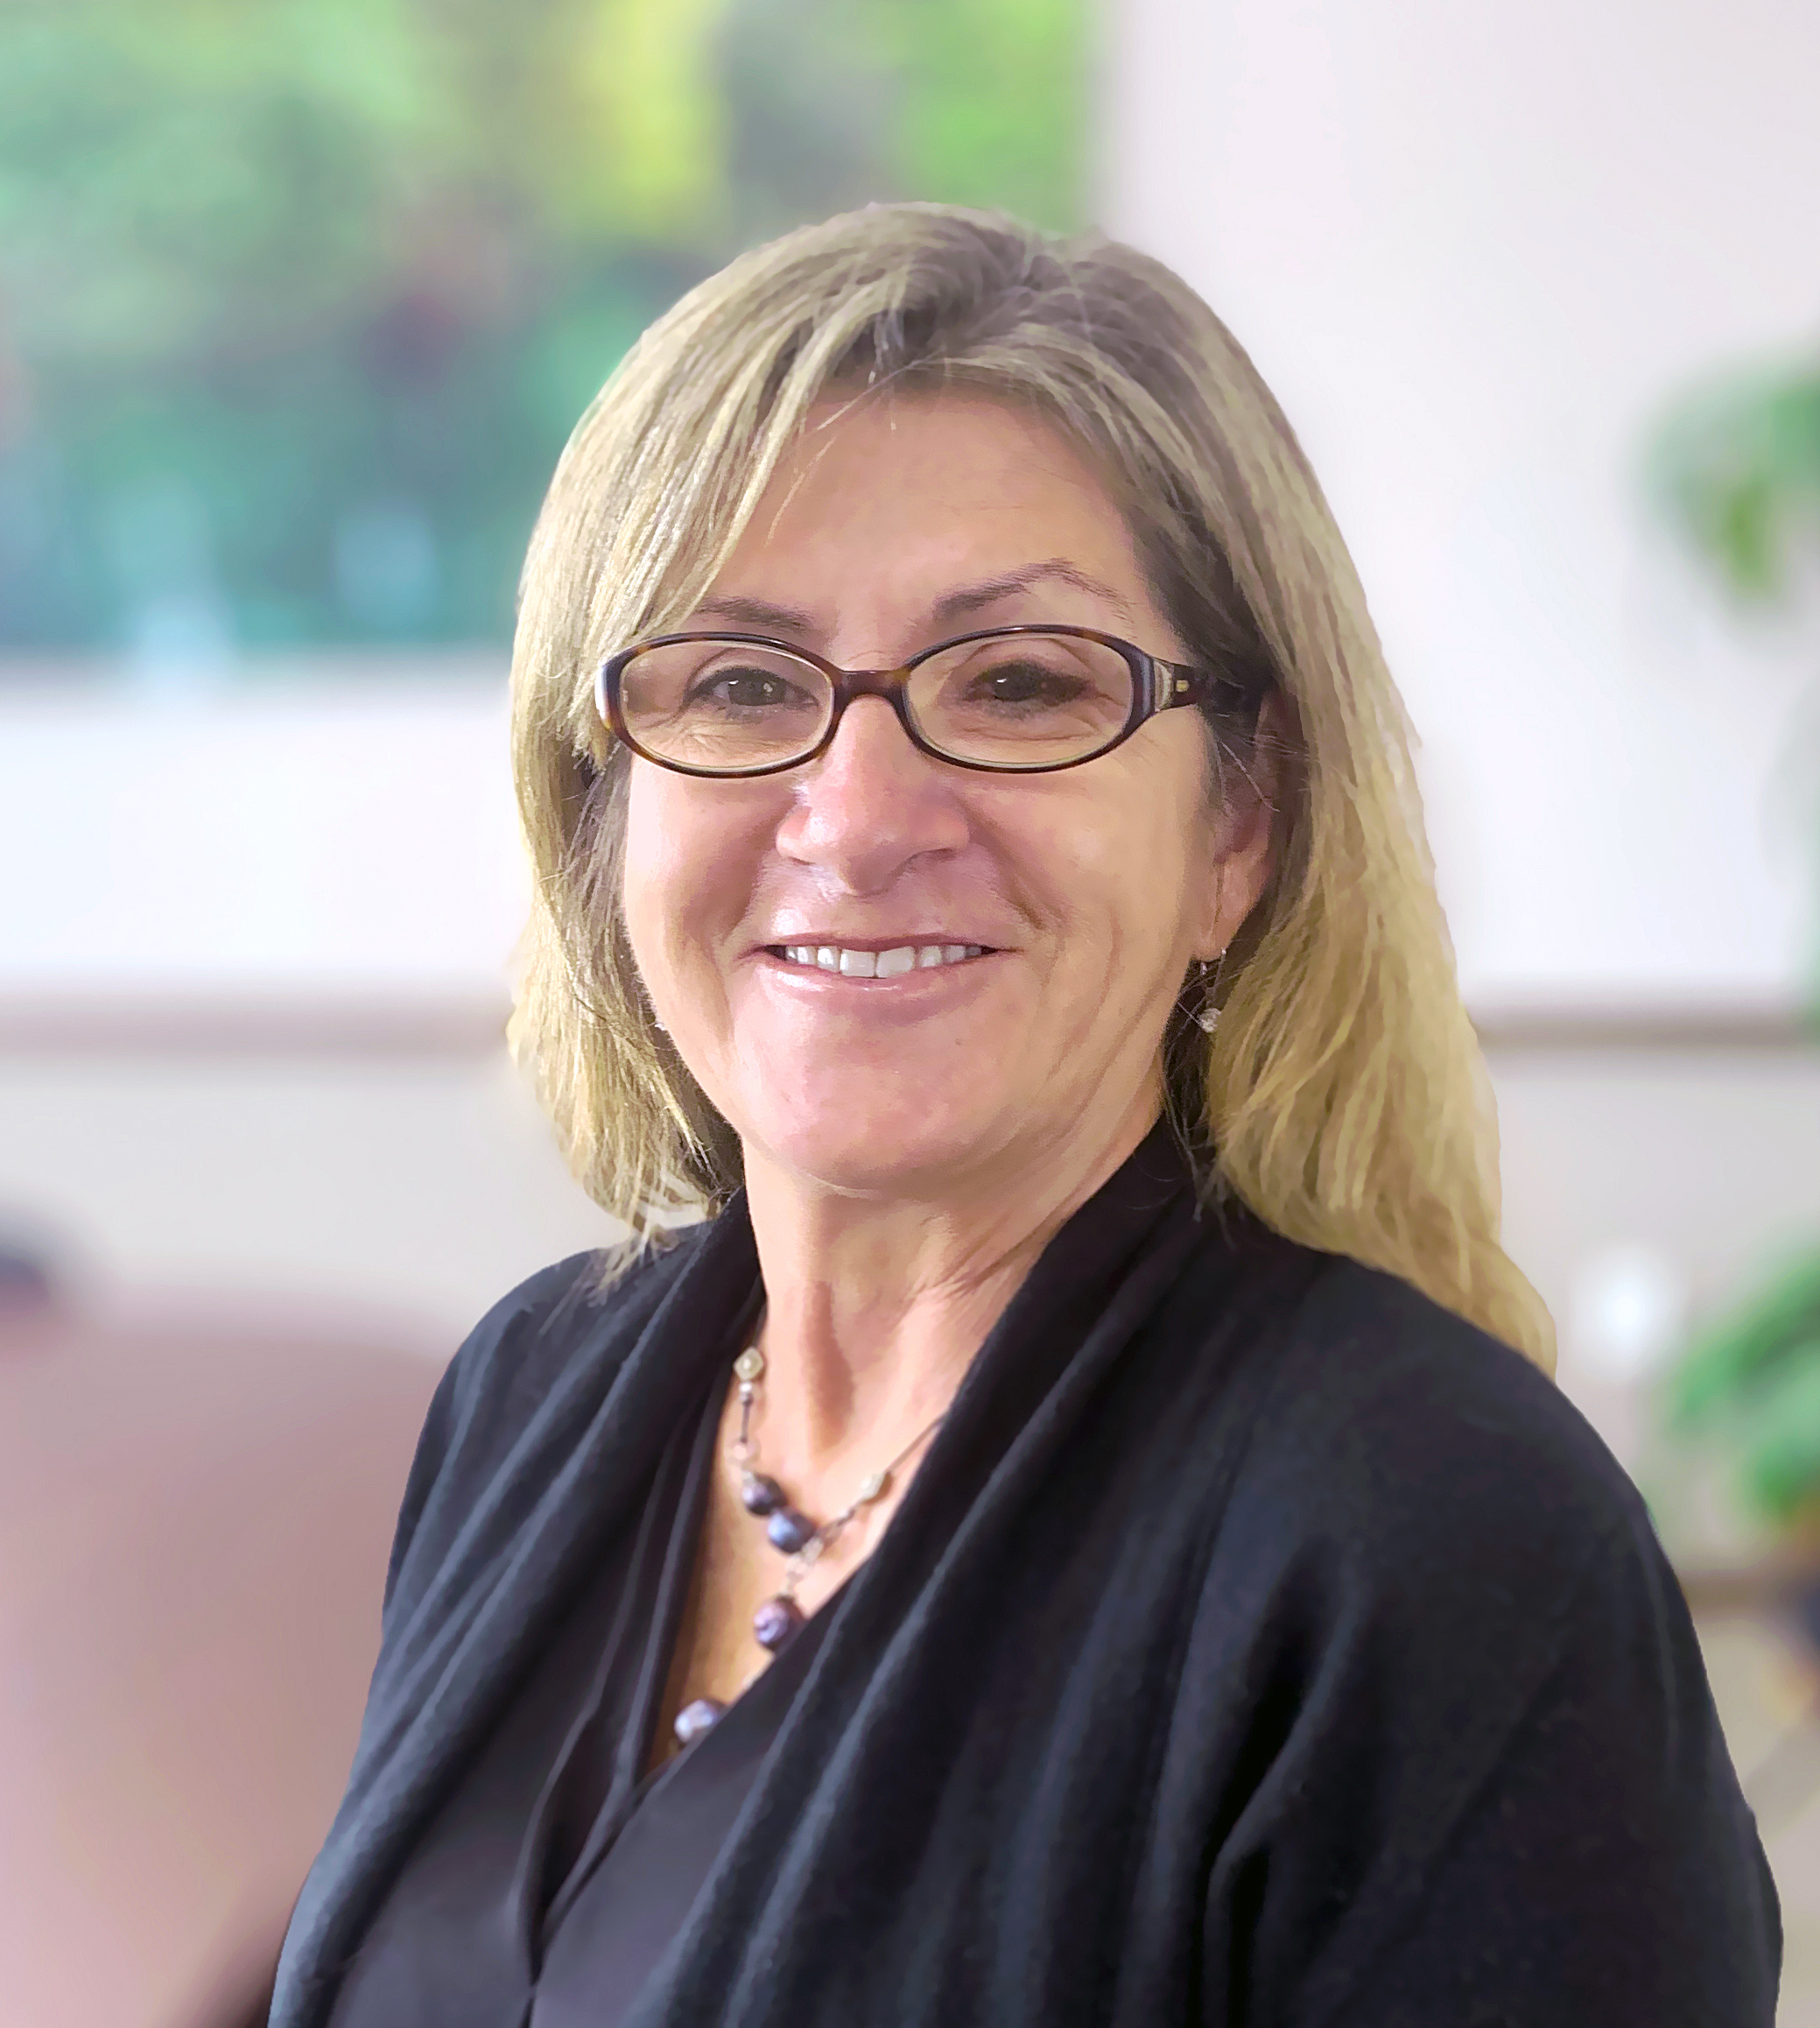 Karen Duncan